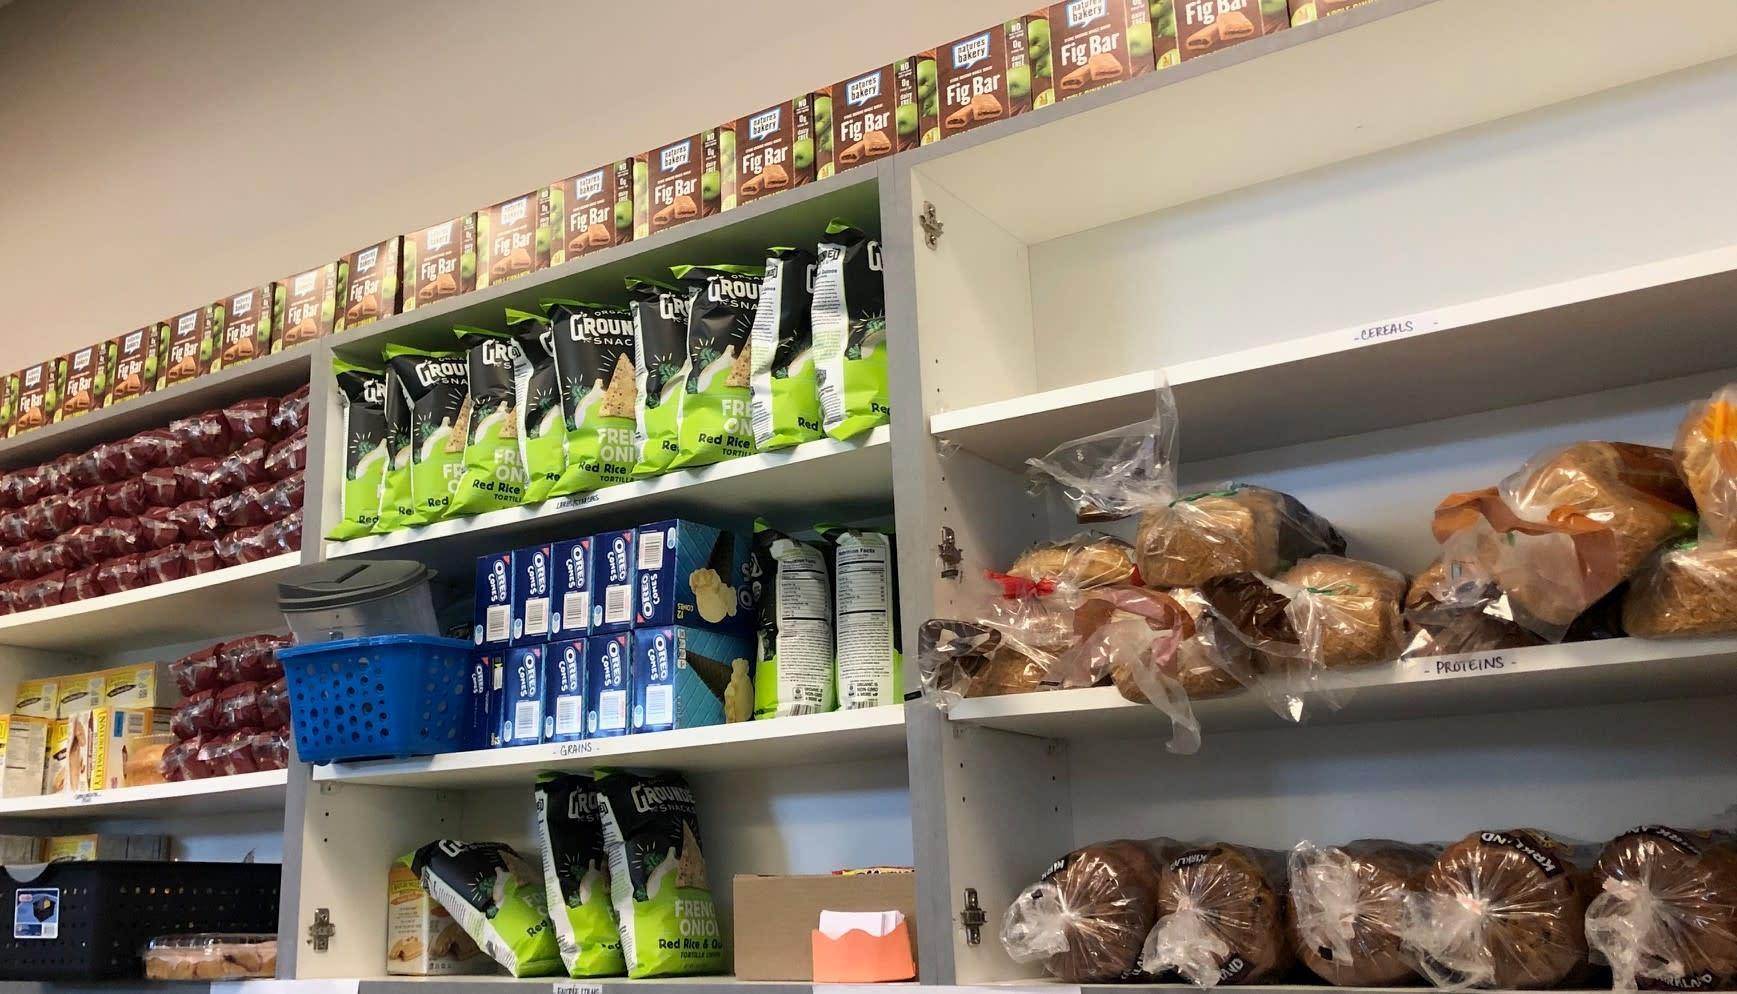 Food pantry shelves